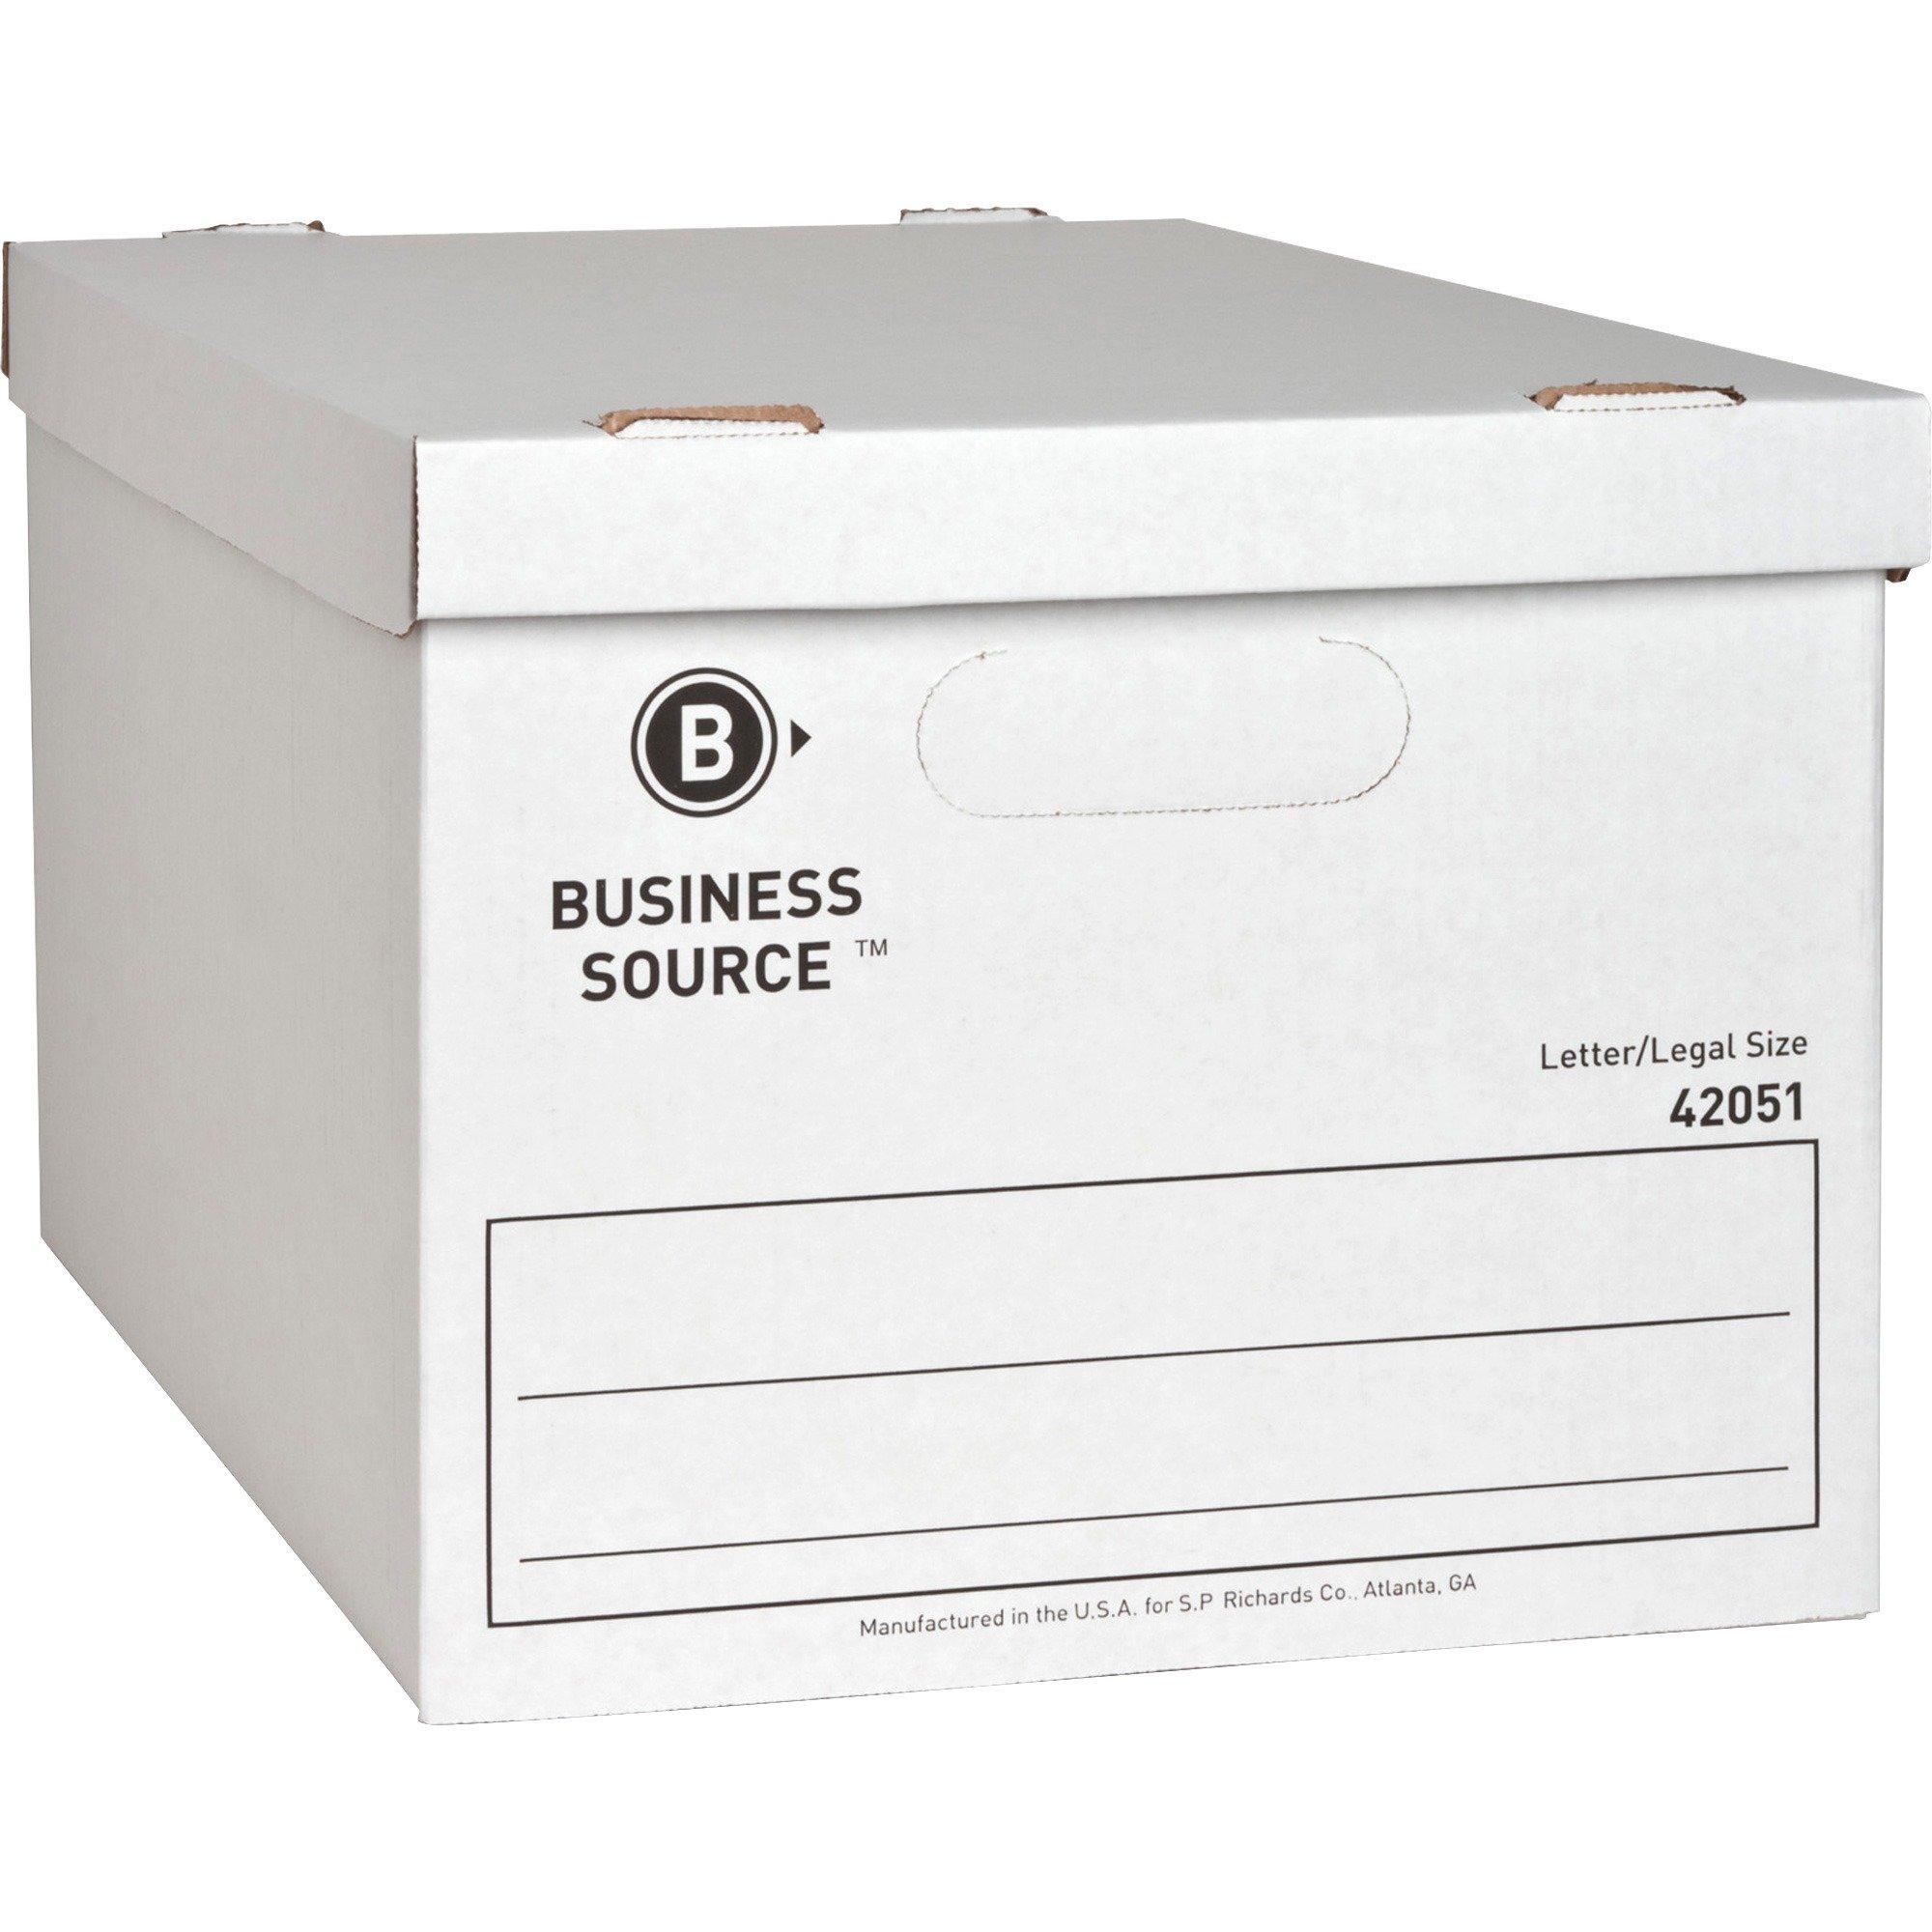 BSN42051 - Business Source File Storage Box